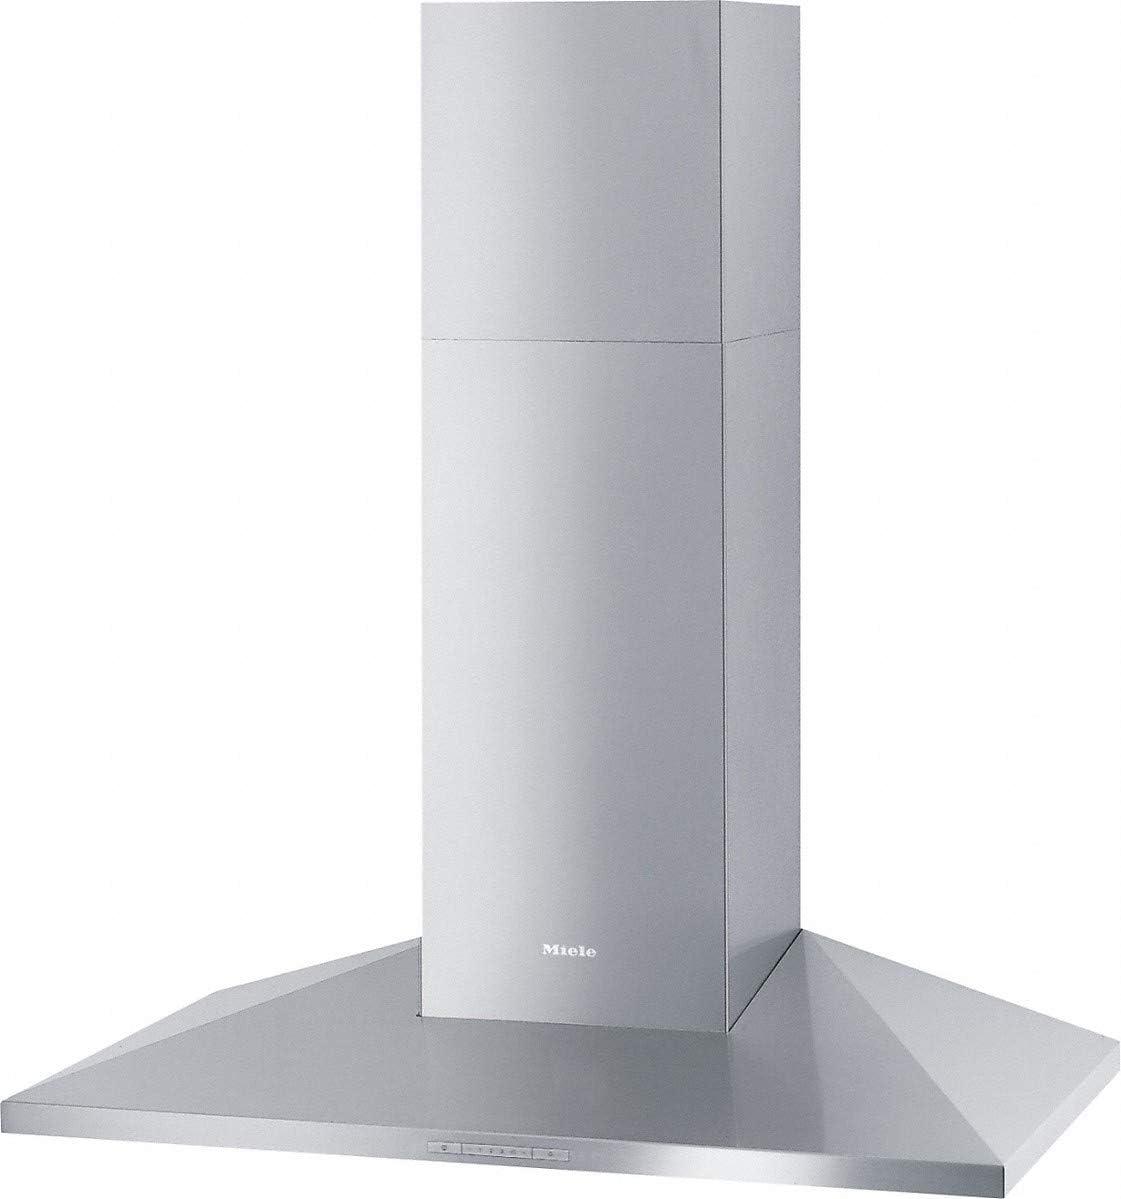 Miele DA 399-7 Classic De pared Acero inoxidable 500m³/h C - Campana (500 m³/h, Canalizado/Recirculación, D, A, A, 55 dB): Amazon.es: Hogar